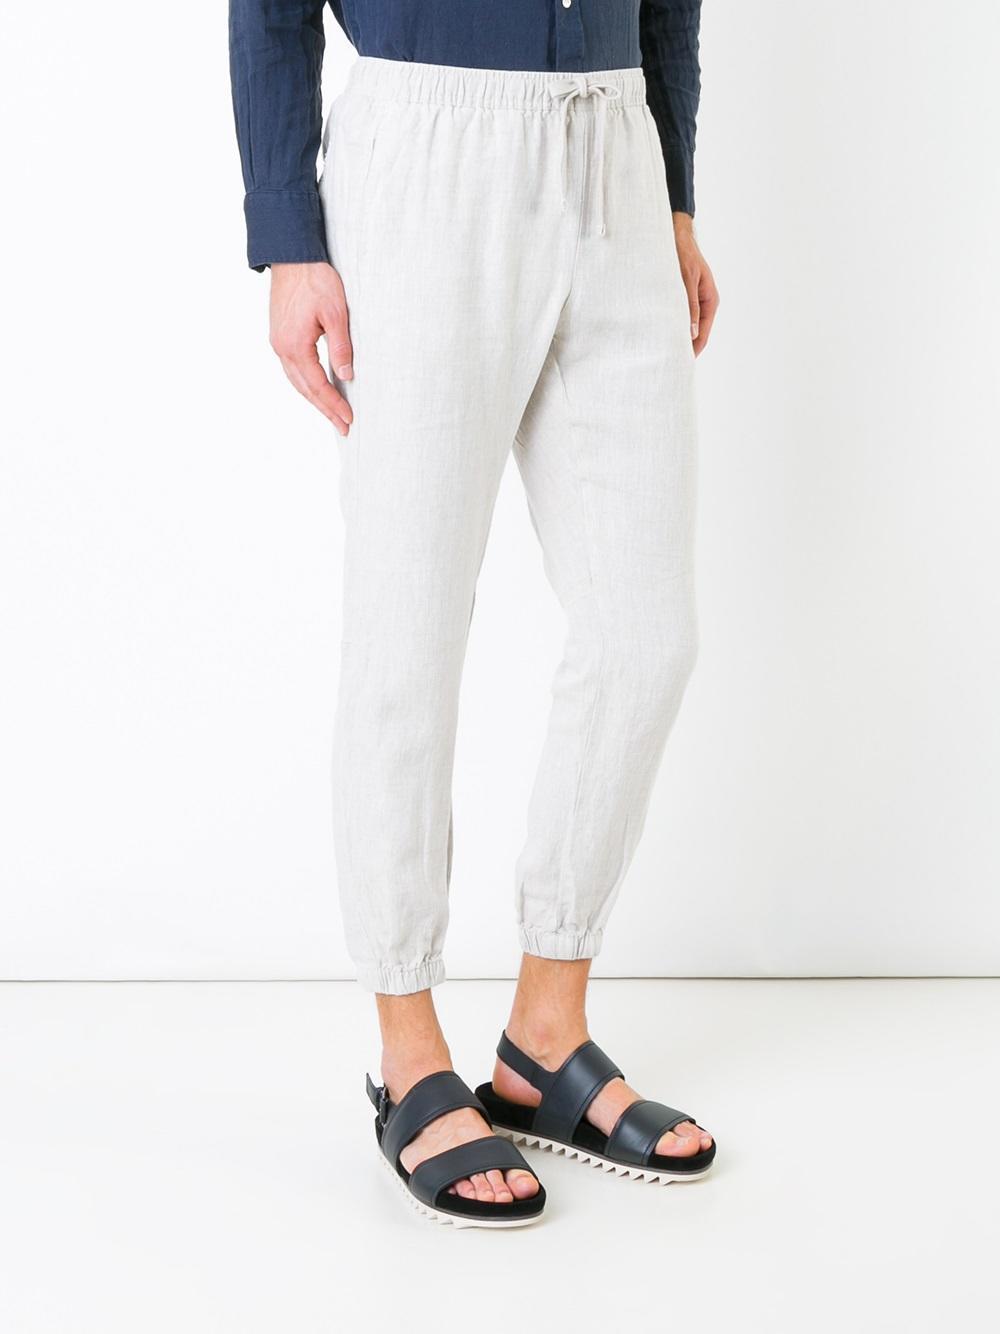 slim-fit Lounge pants - Nude & Neutrals Venroy p9WrlAH6Vr